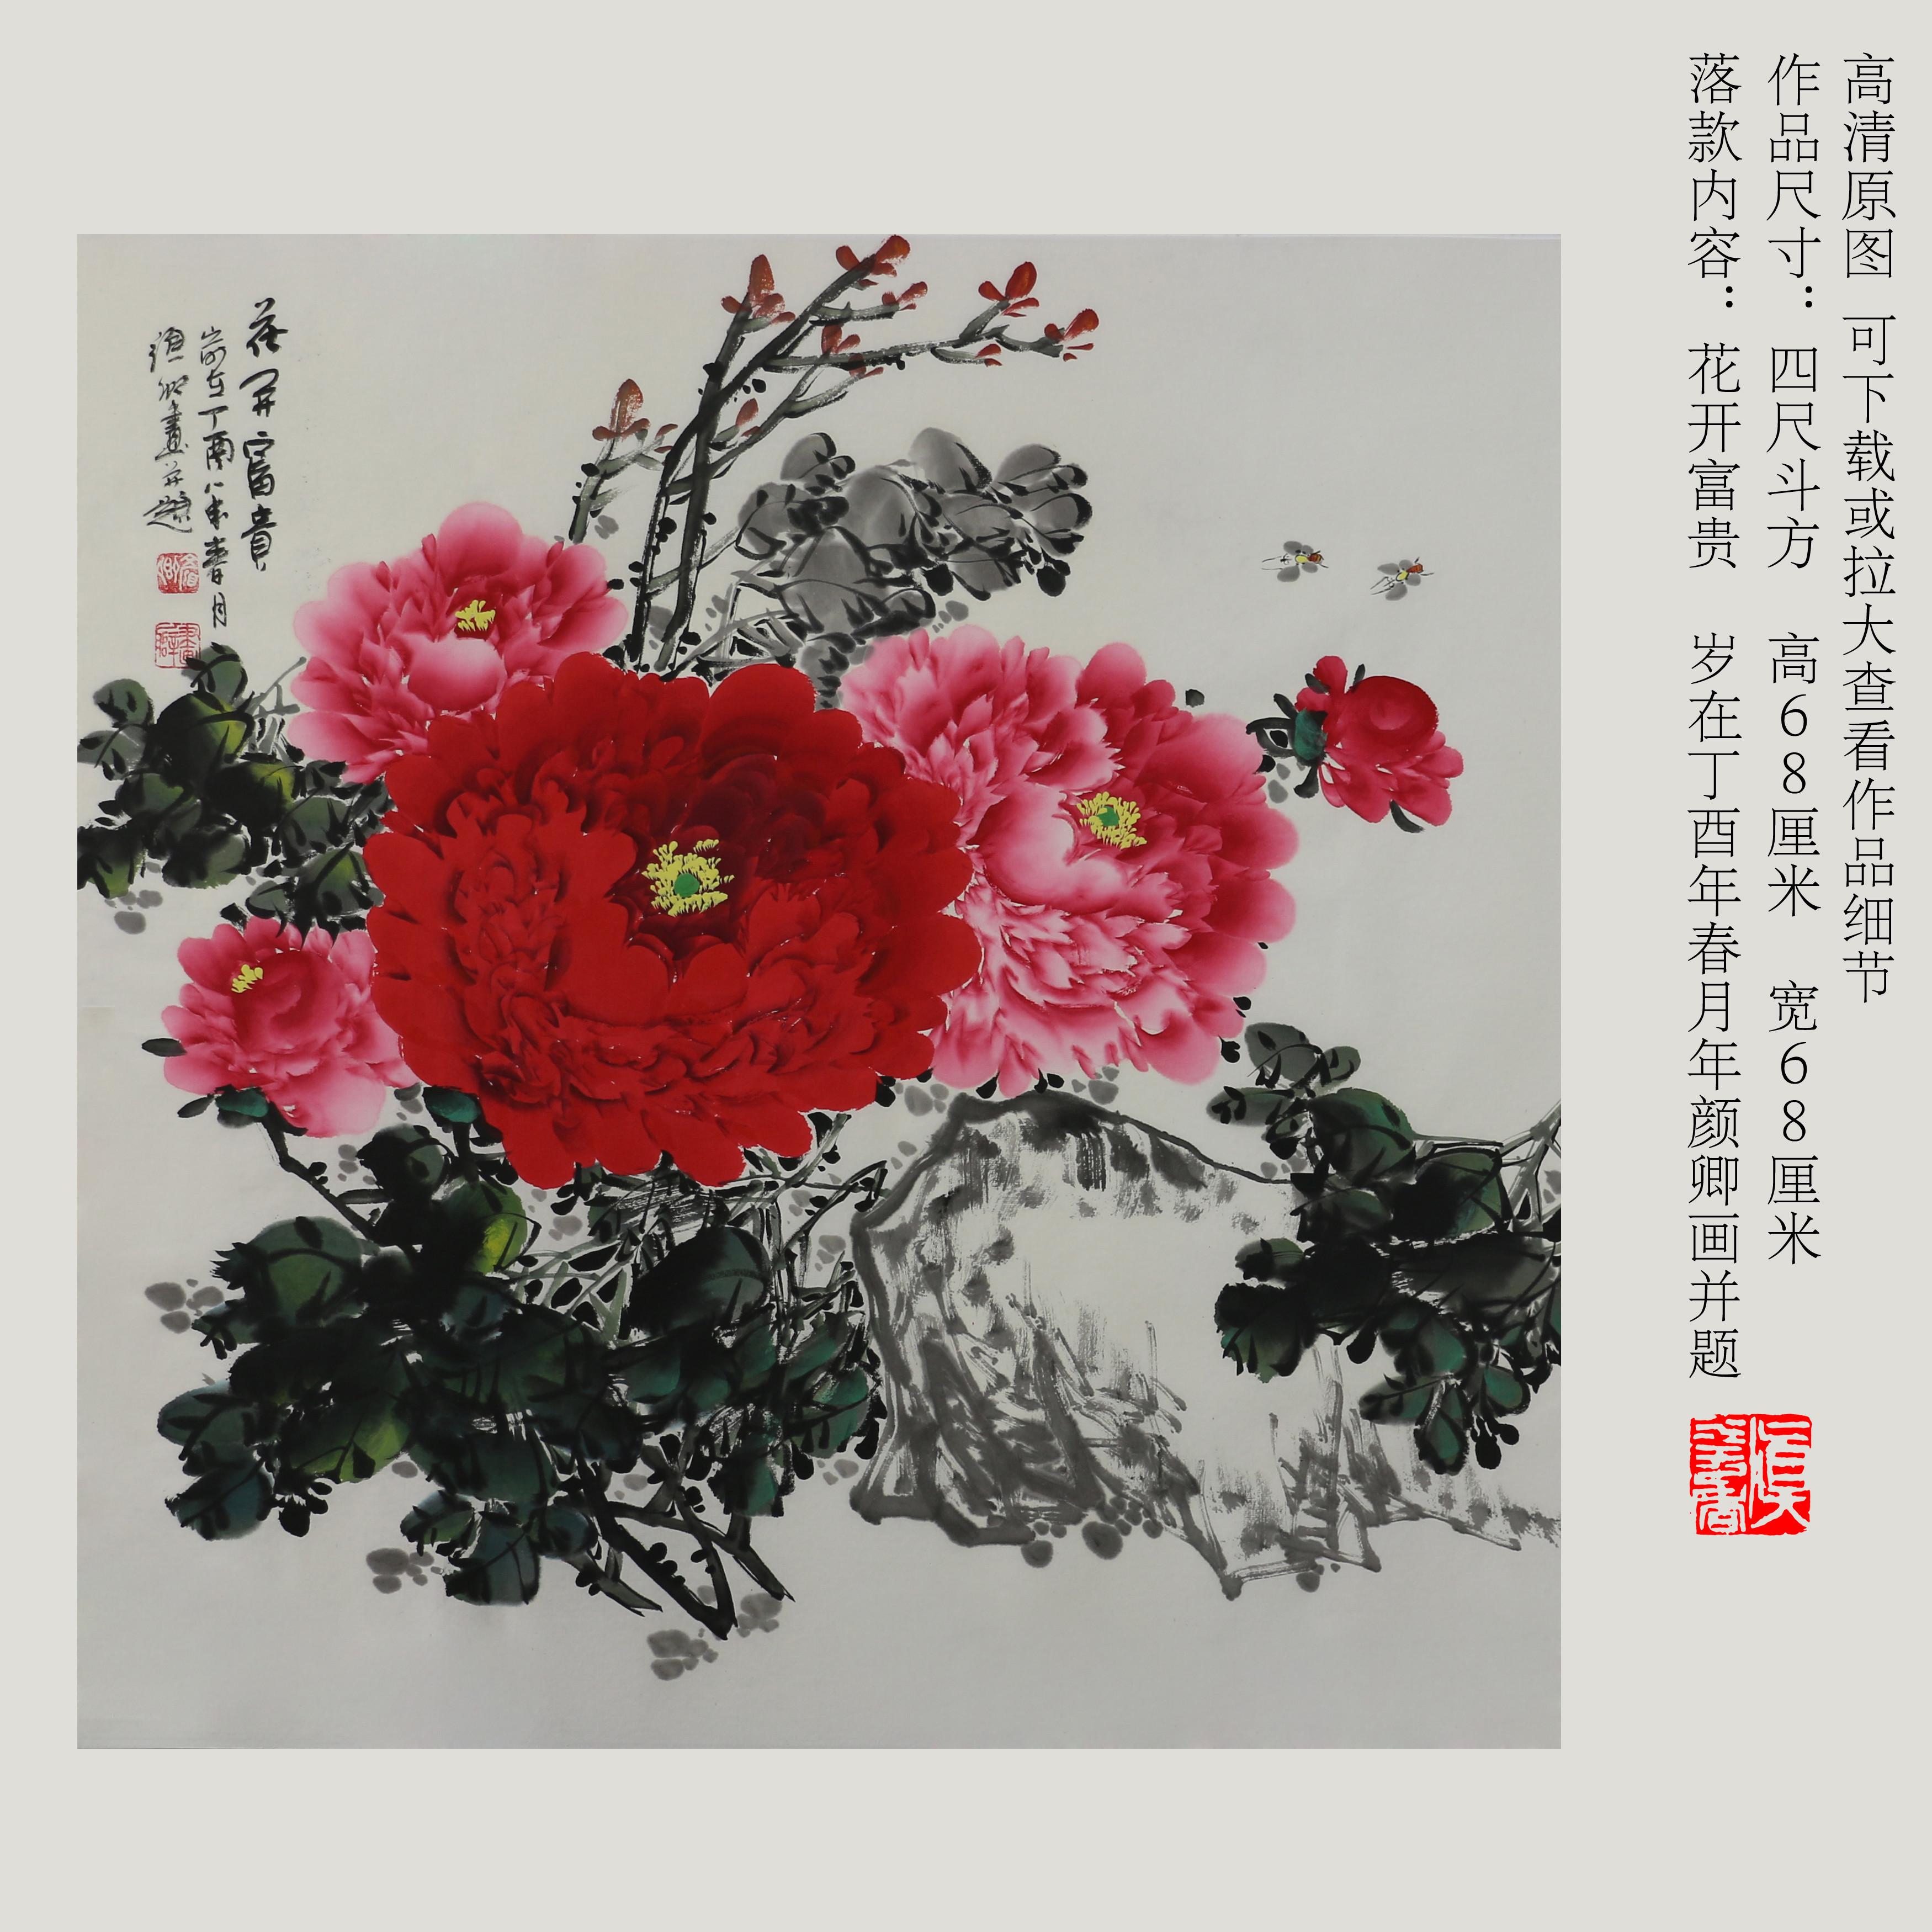 Китайская живопись Артикул 574242572366